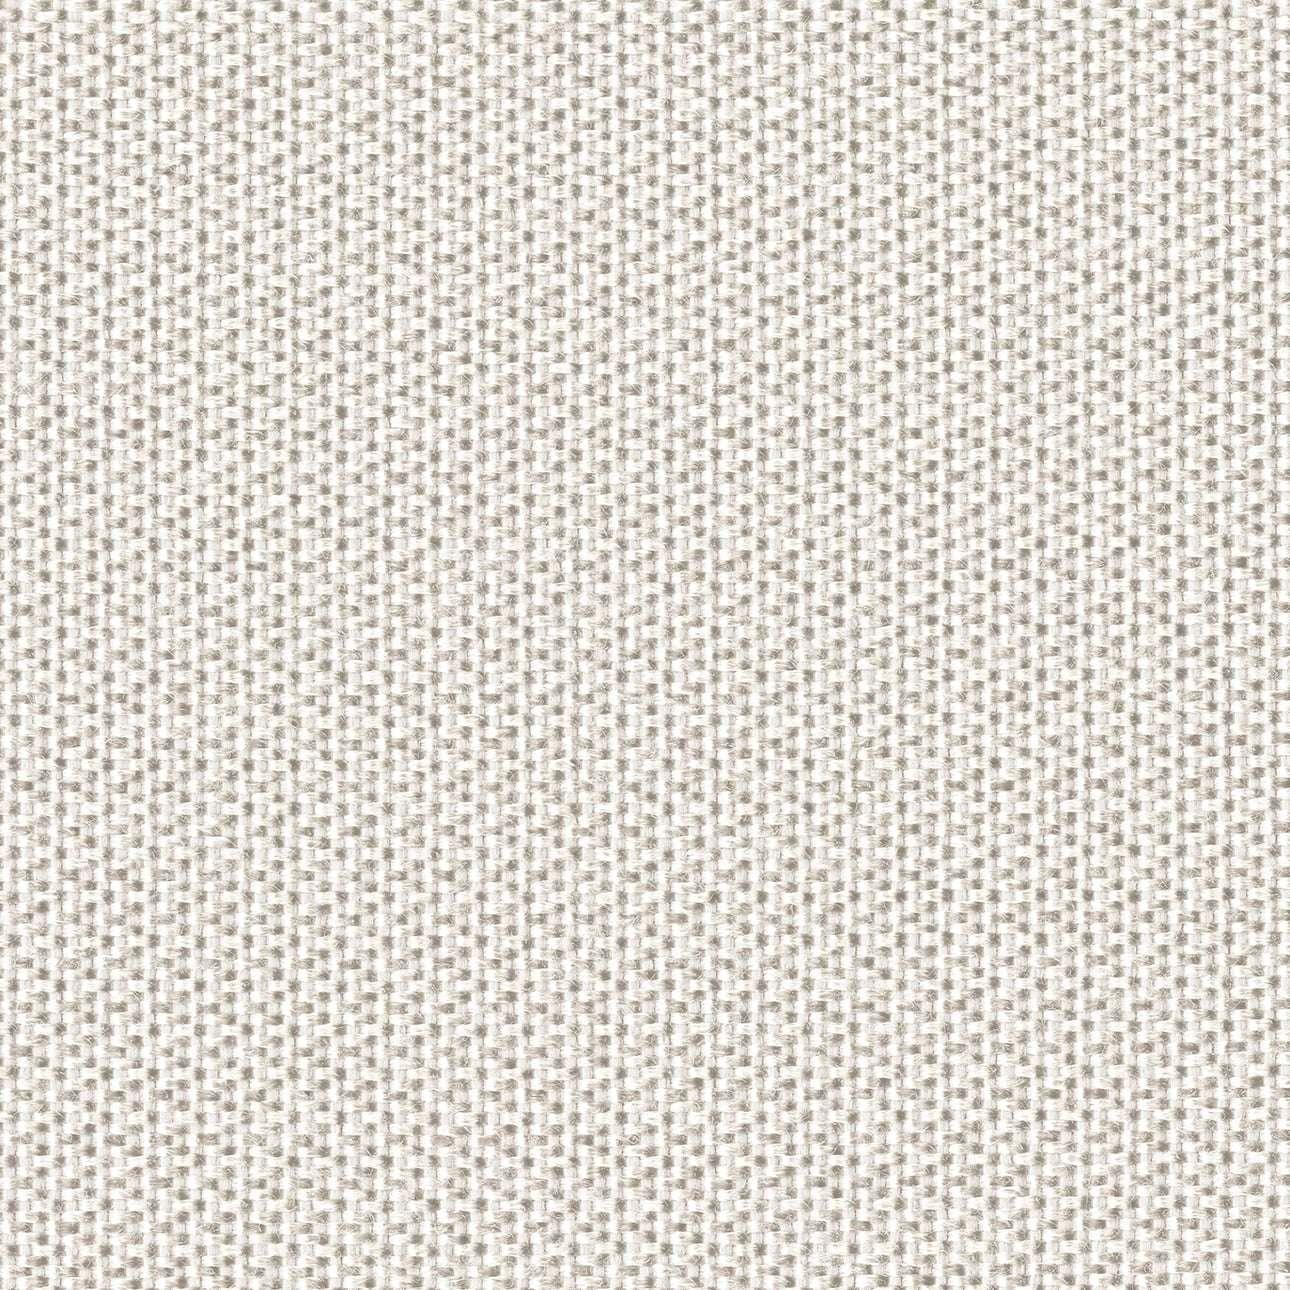 Pokrowiec na fotel Kivik w kolekcji Bergen, tkanina: 161-76